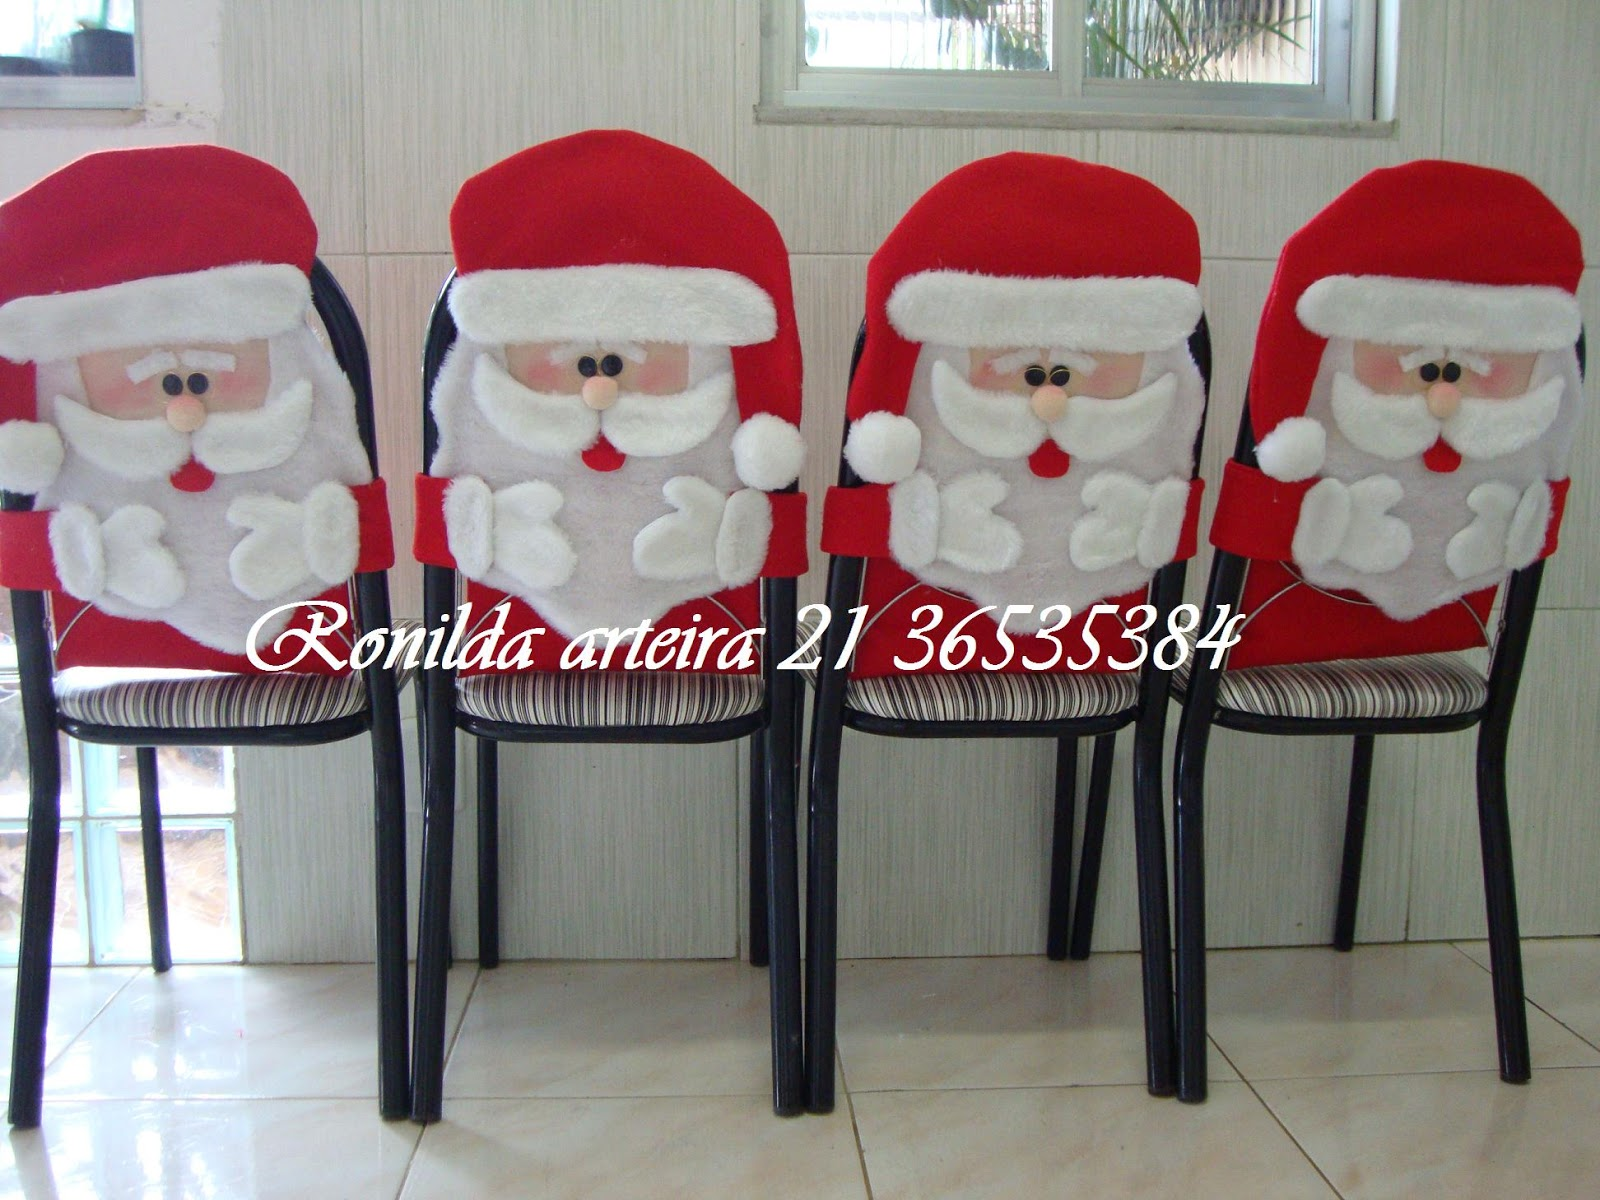 Capa encosto de cadeira natal. Urso papai noel mamãe noel e rena  #8C1724 1600x1200